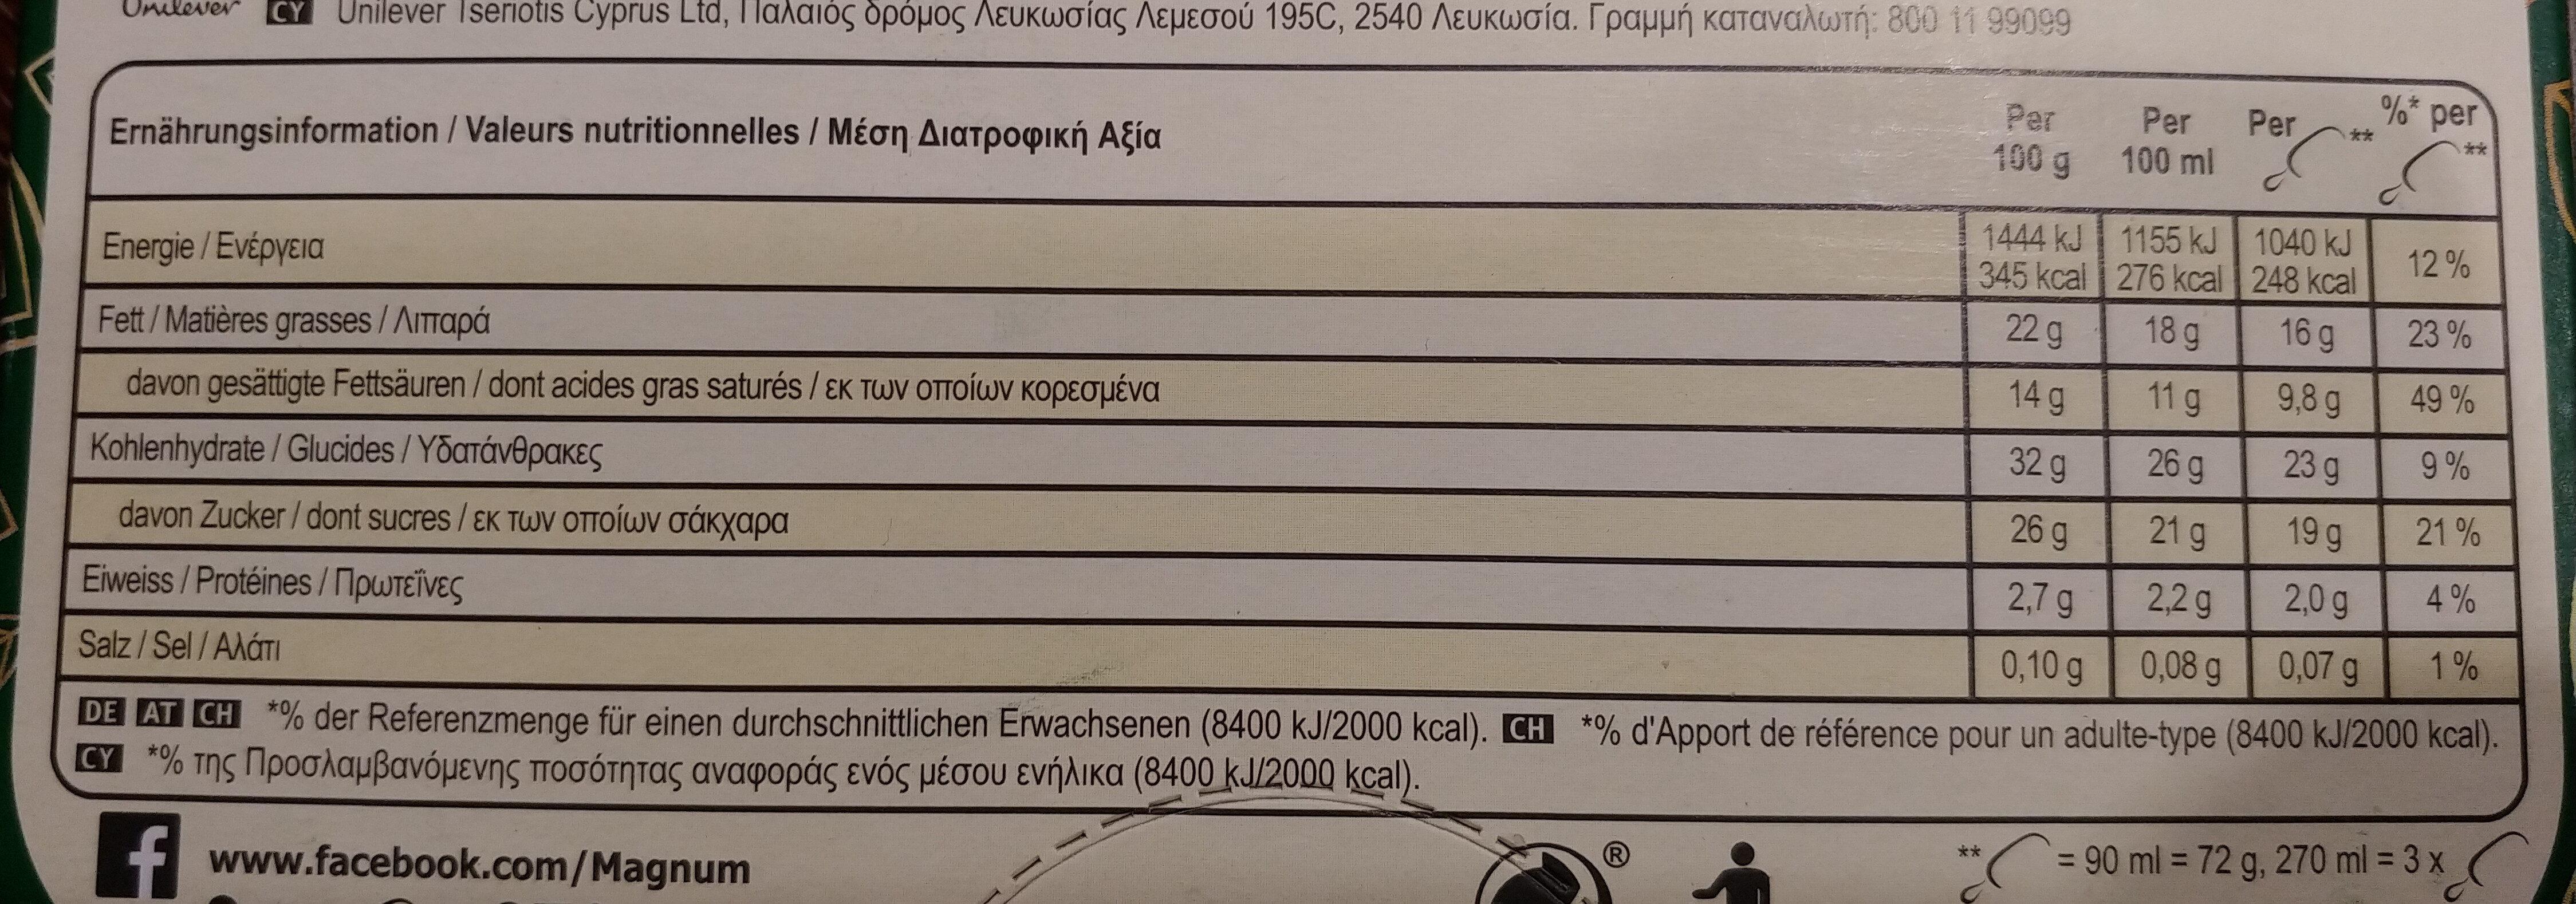 Magnum Glace Bâtonnet Amande Vegan 3x90ml - Nährwertangaben - de